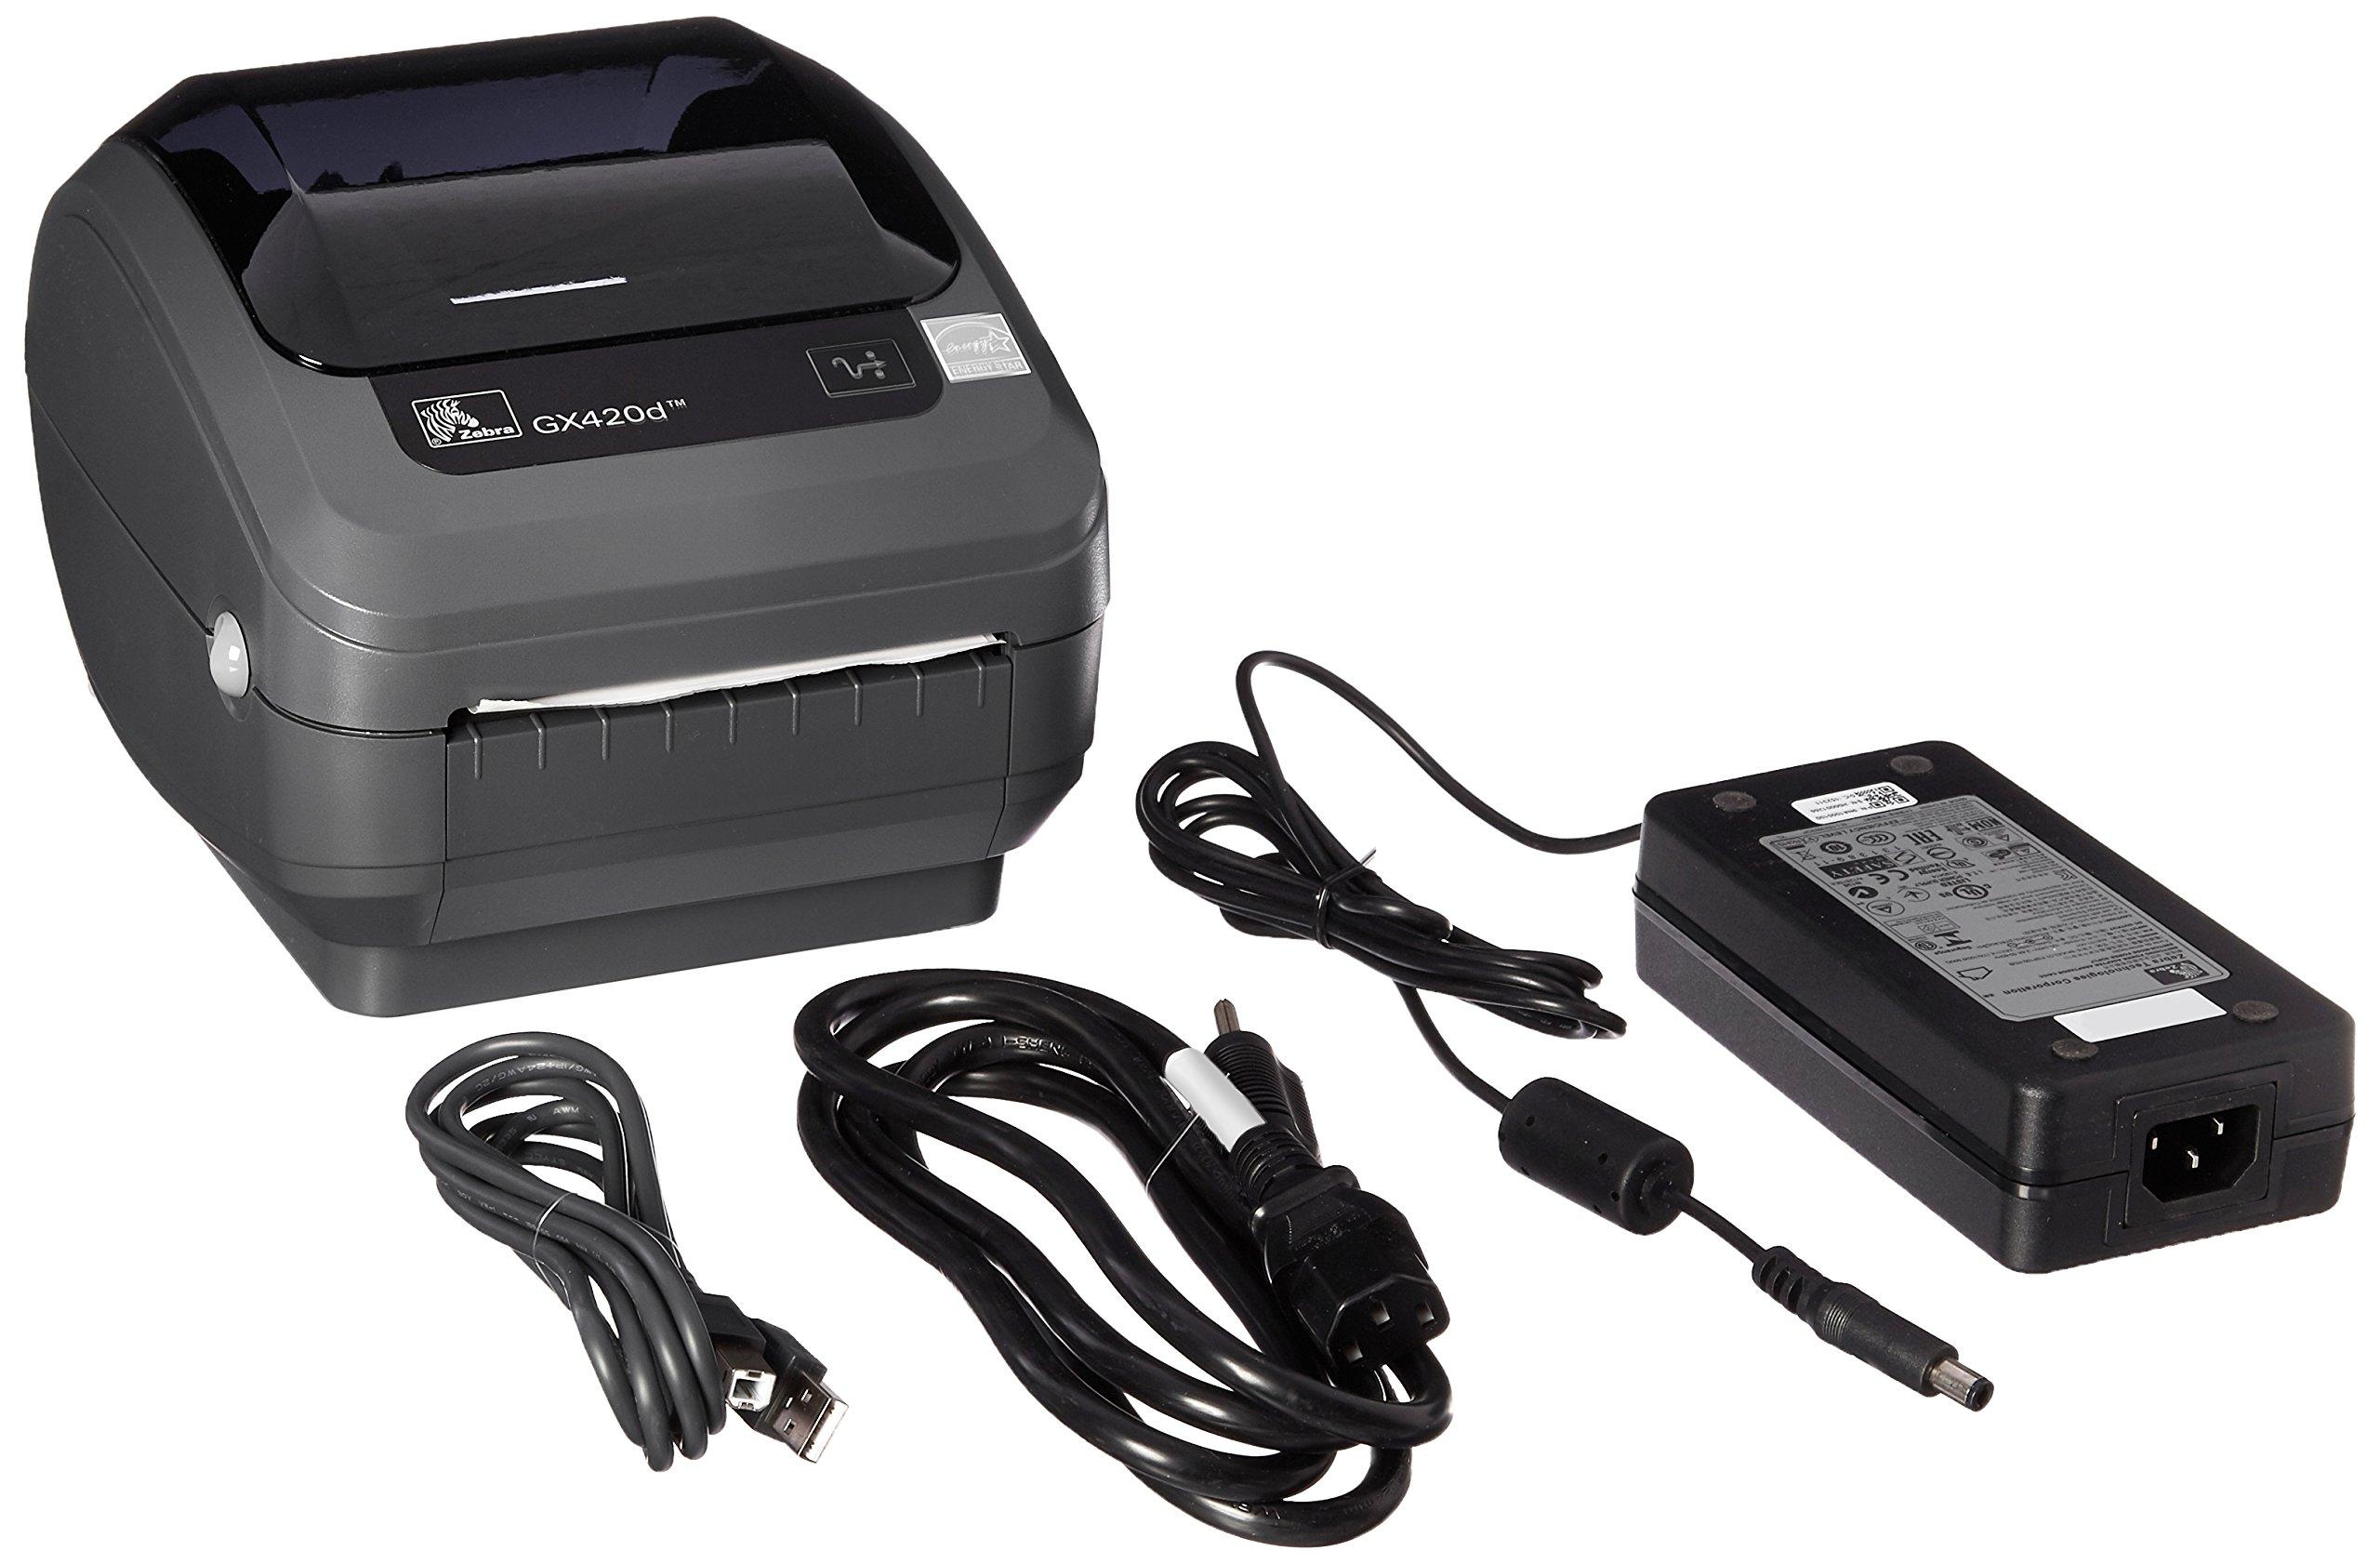 Zebra GX420d Monochrome Desktop Direct Thermal Label Printer with Fast Ethernet Technology, 6 in/s Print Speed, 203 dpi Print Resolution, 4.09'' Print Width, 100-240V AC